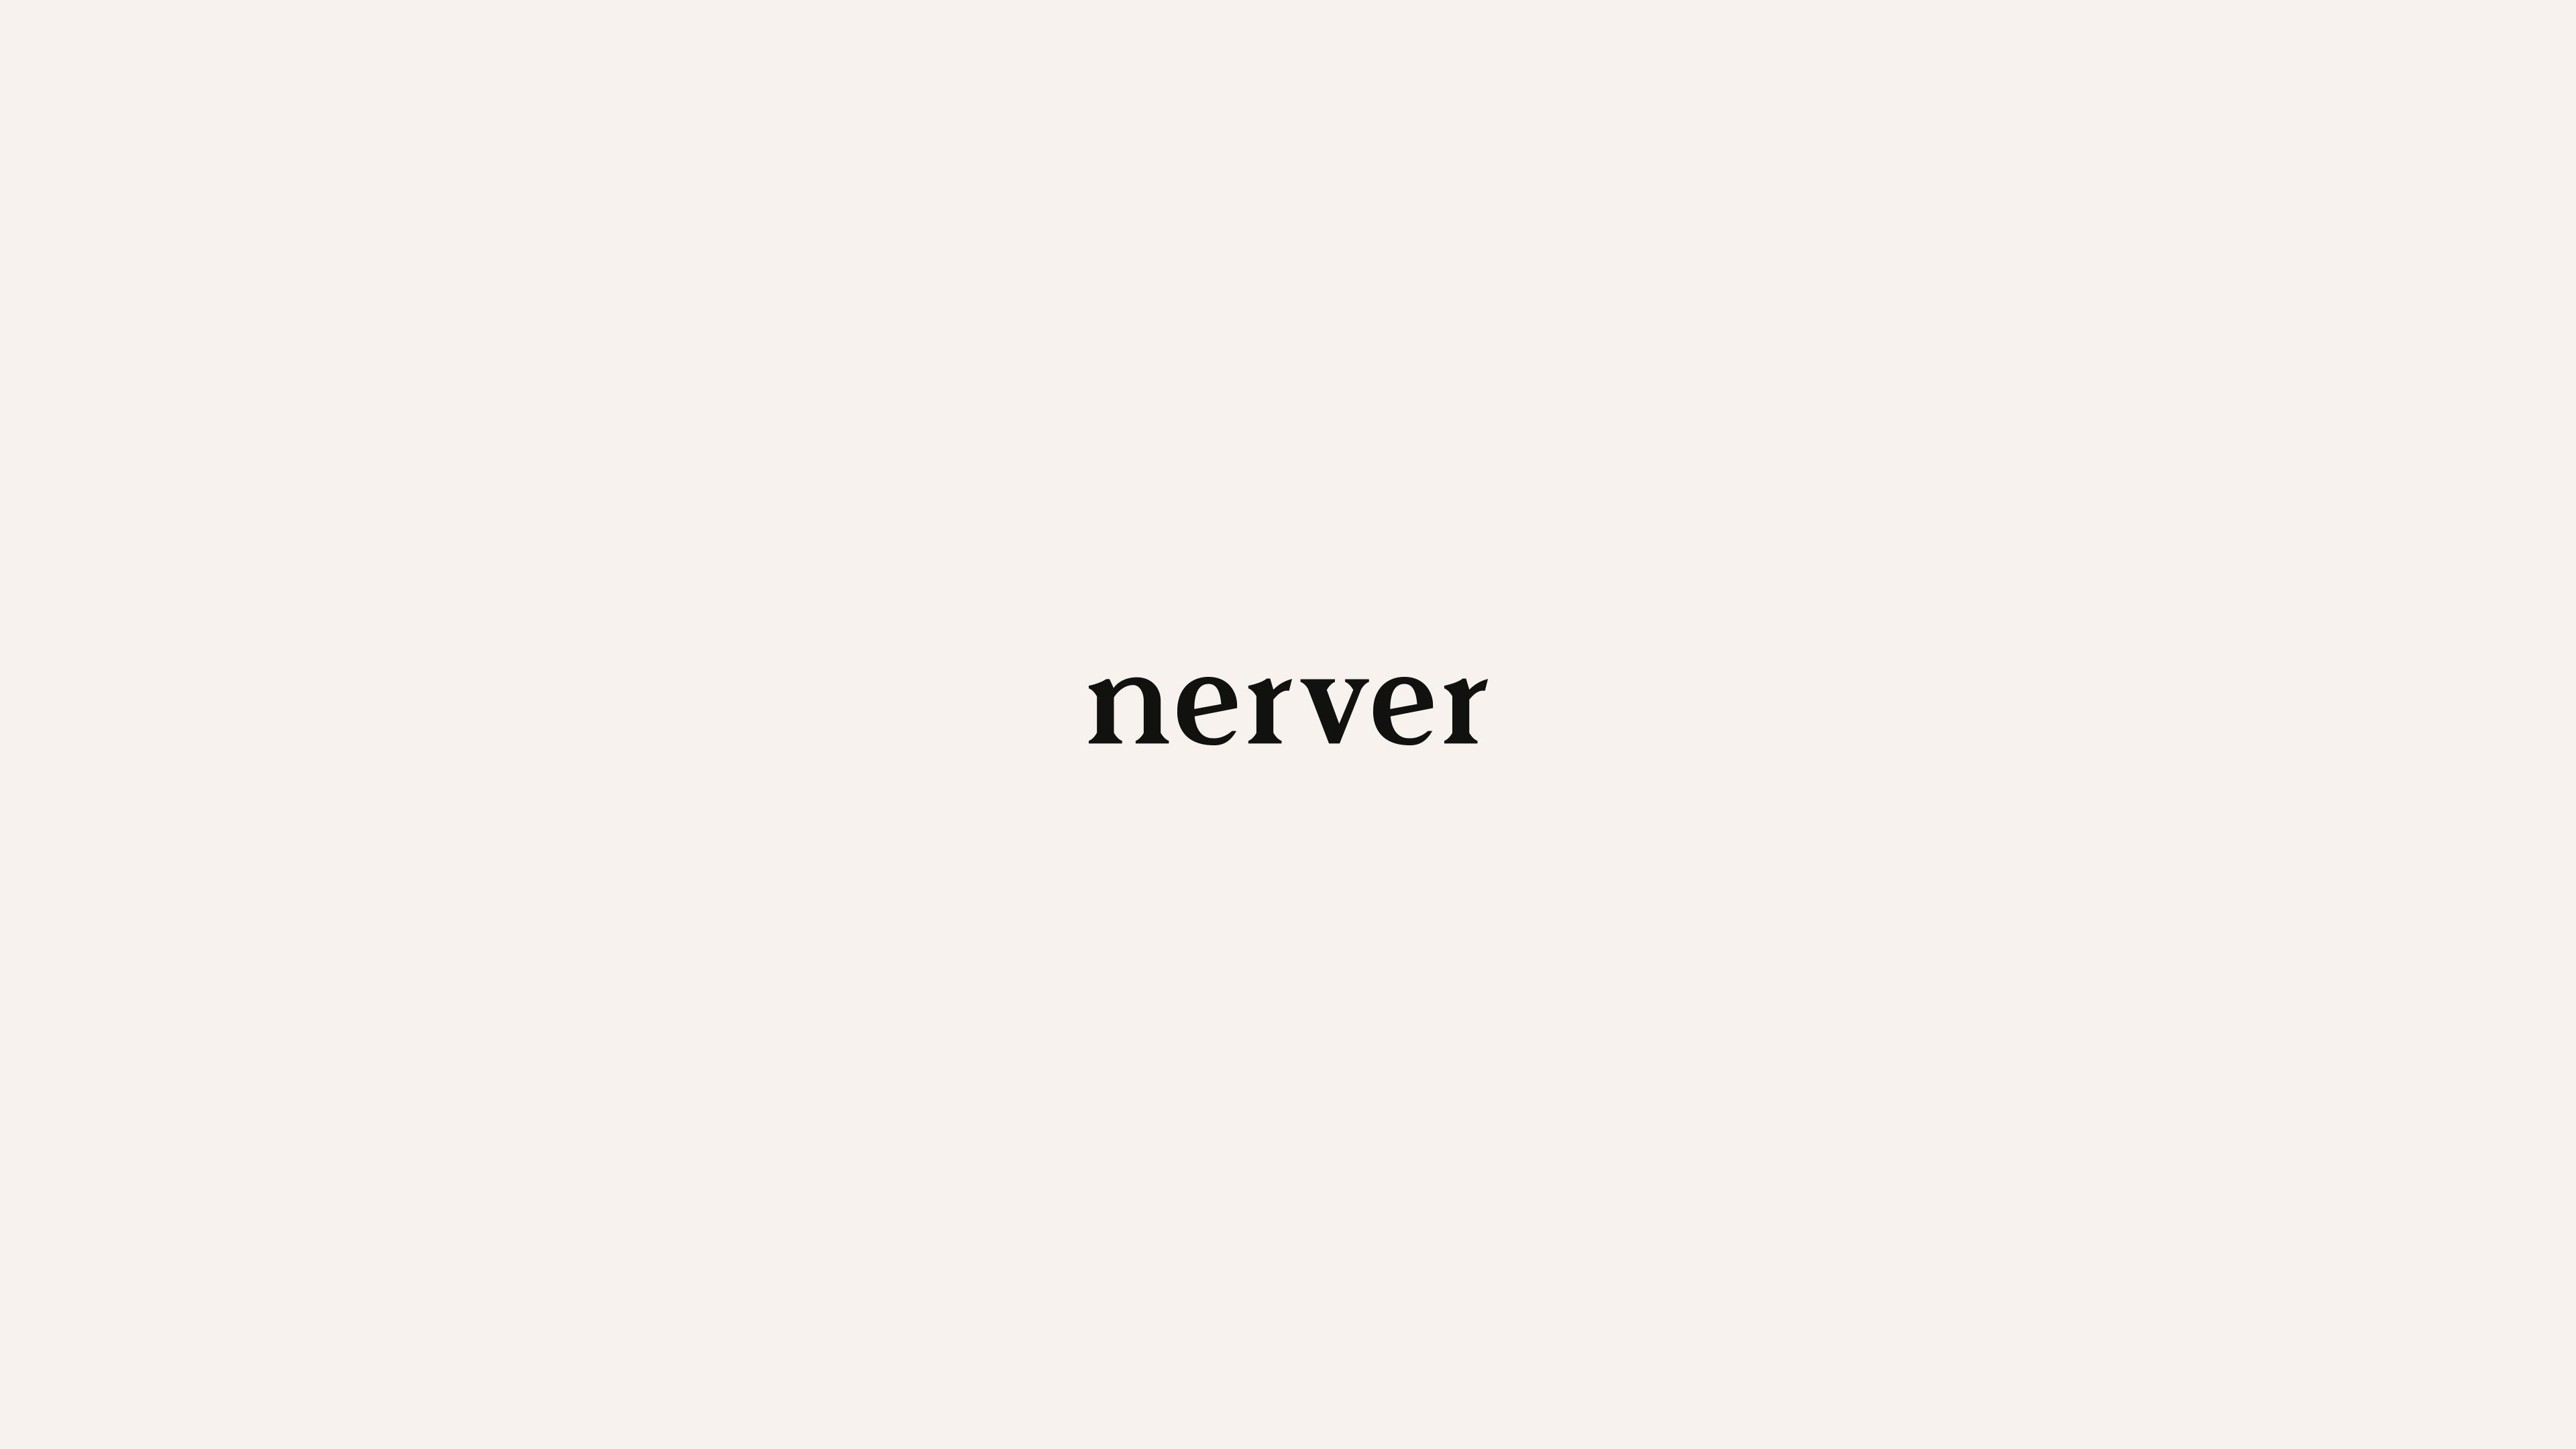 Nerver logo